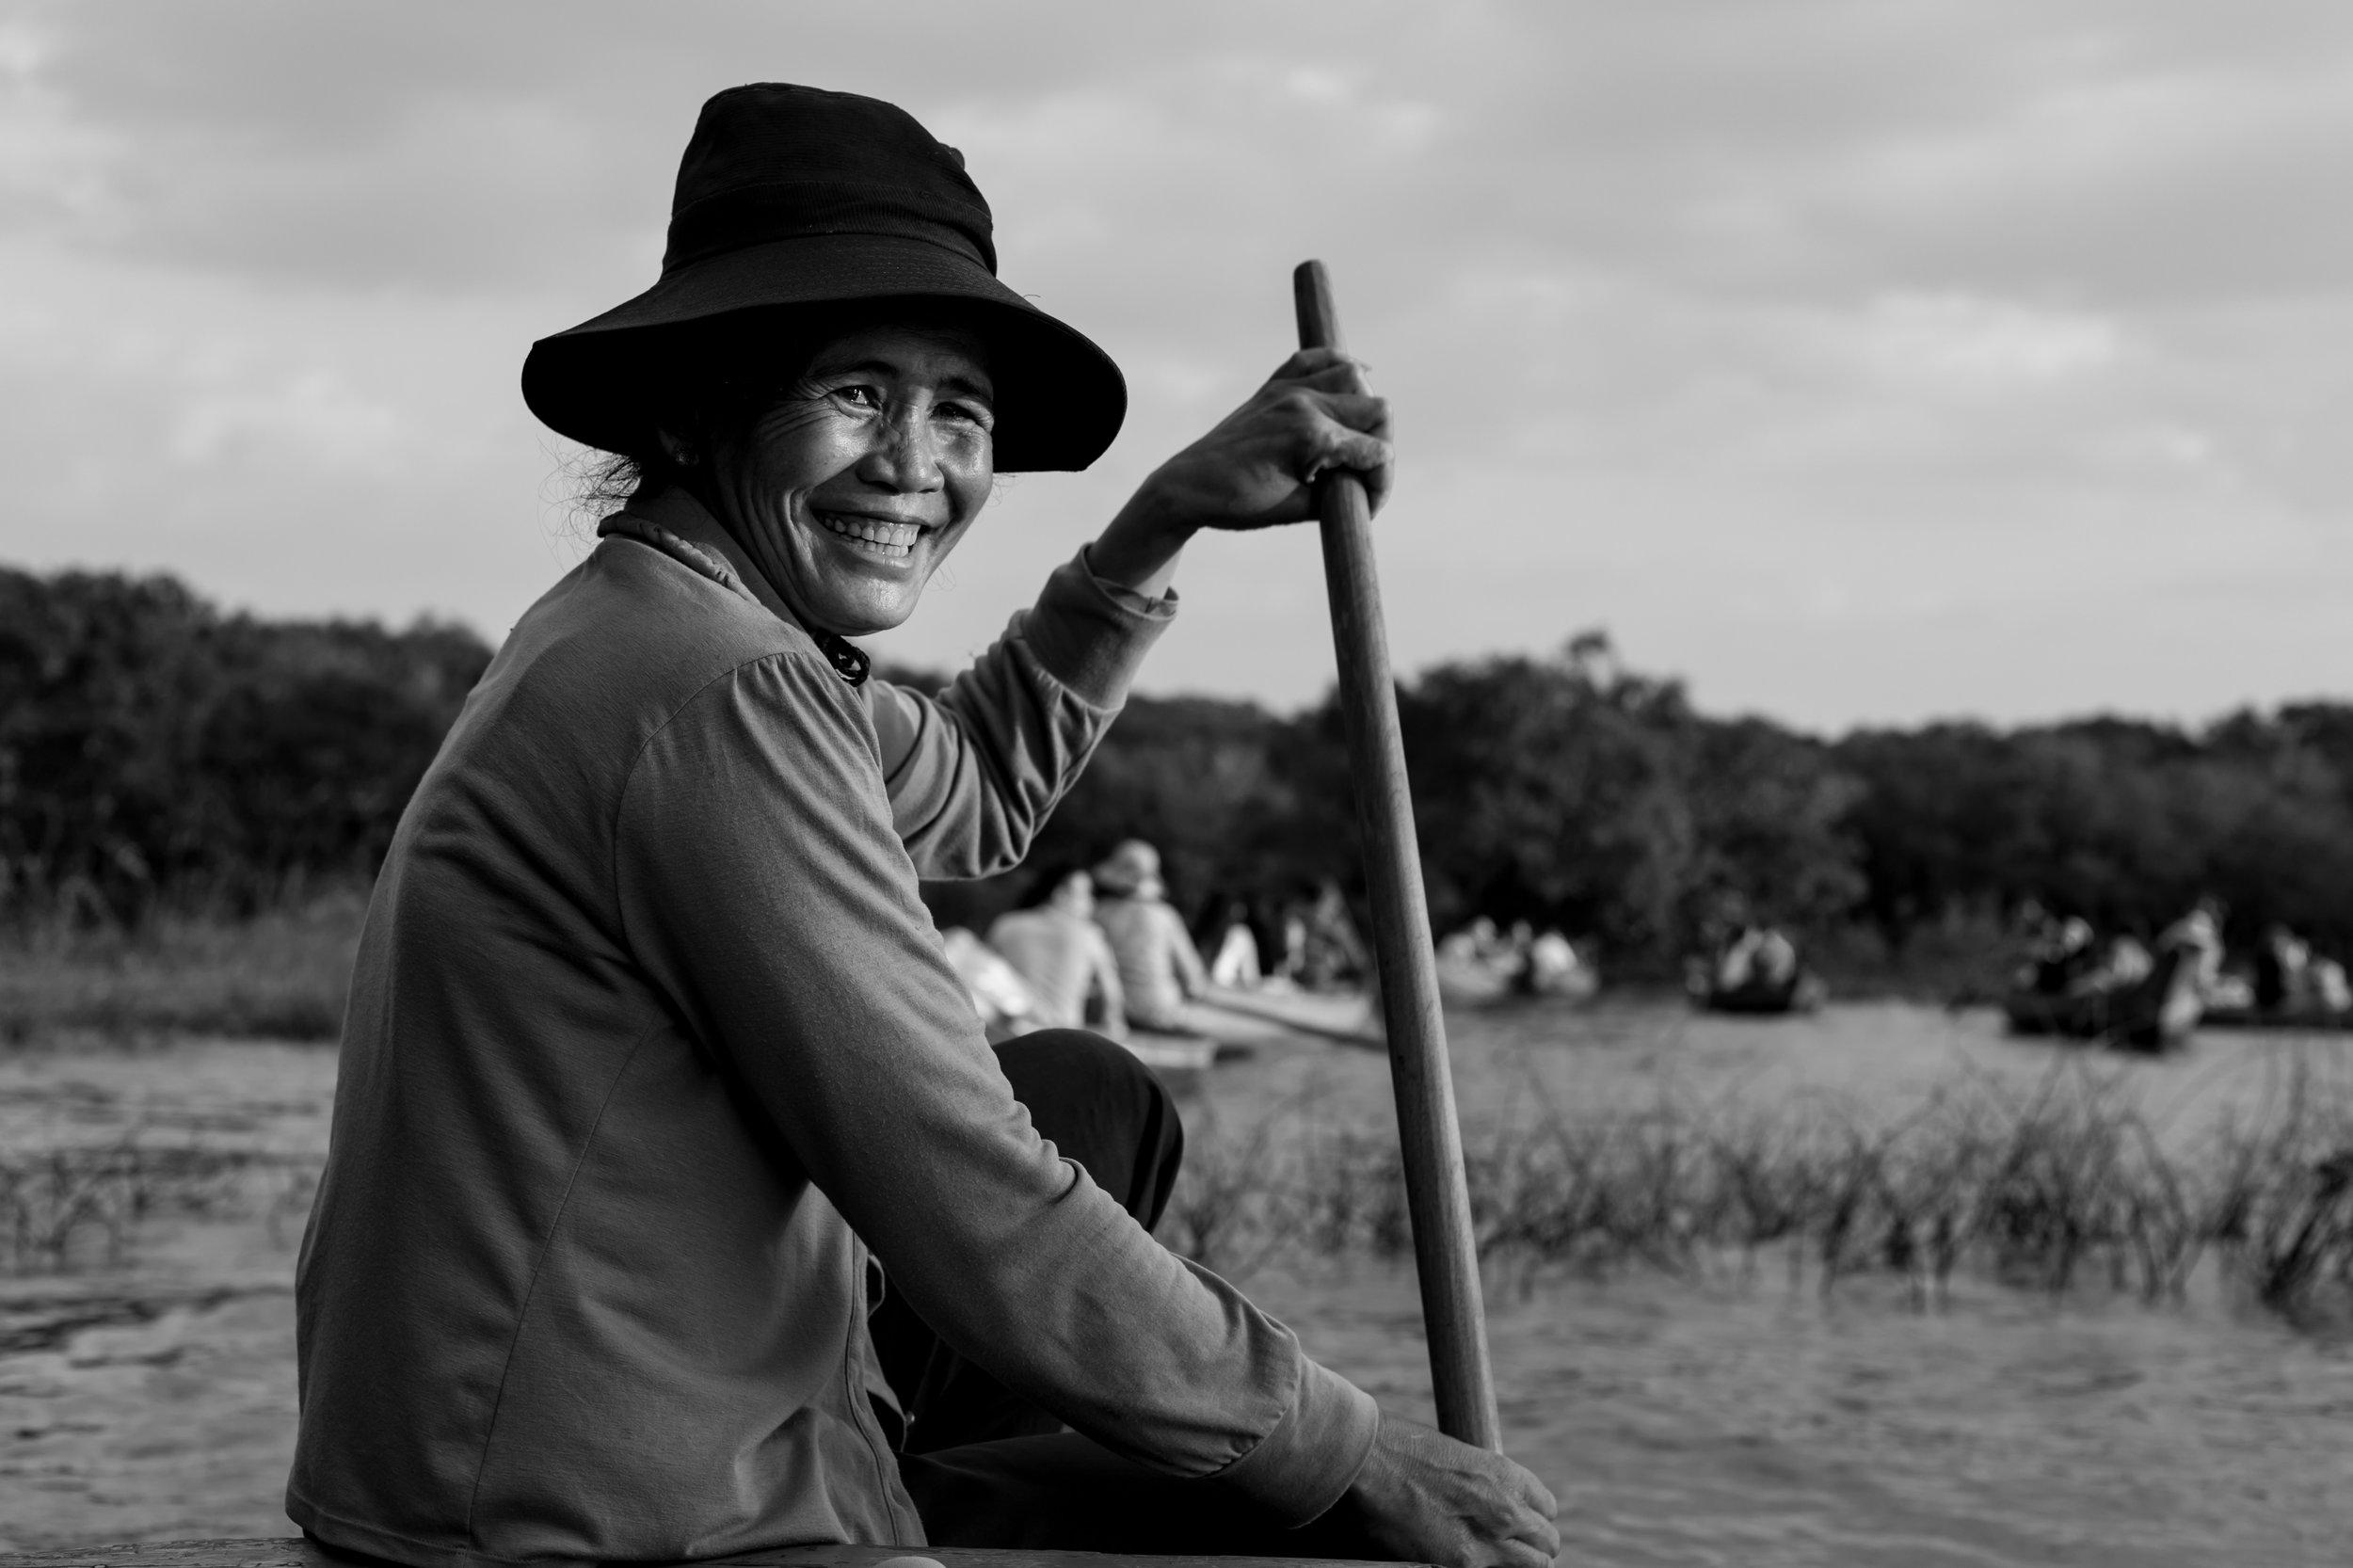 Han, Khampong Phluk - December 2017